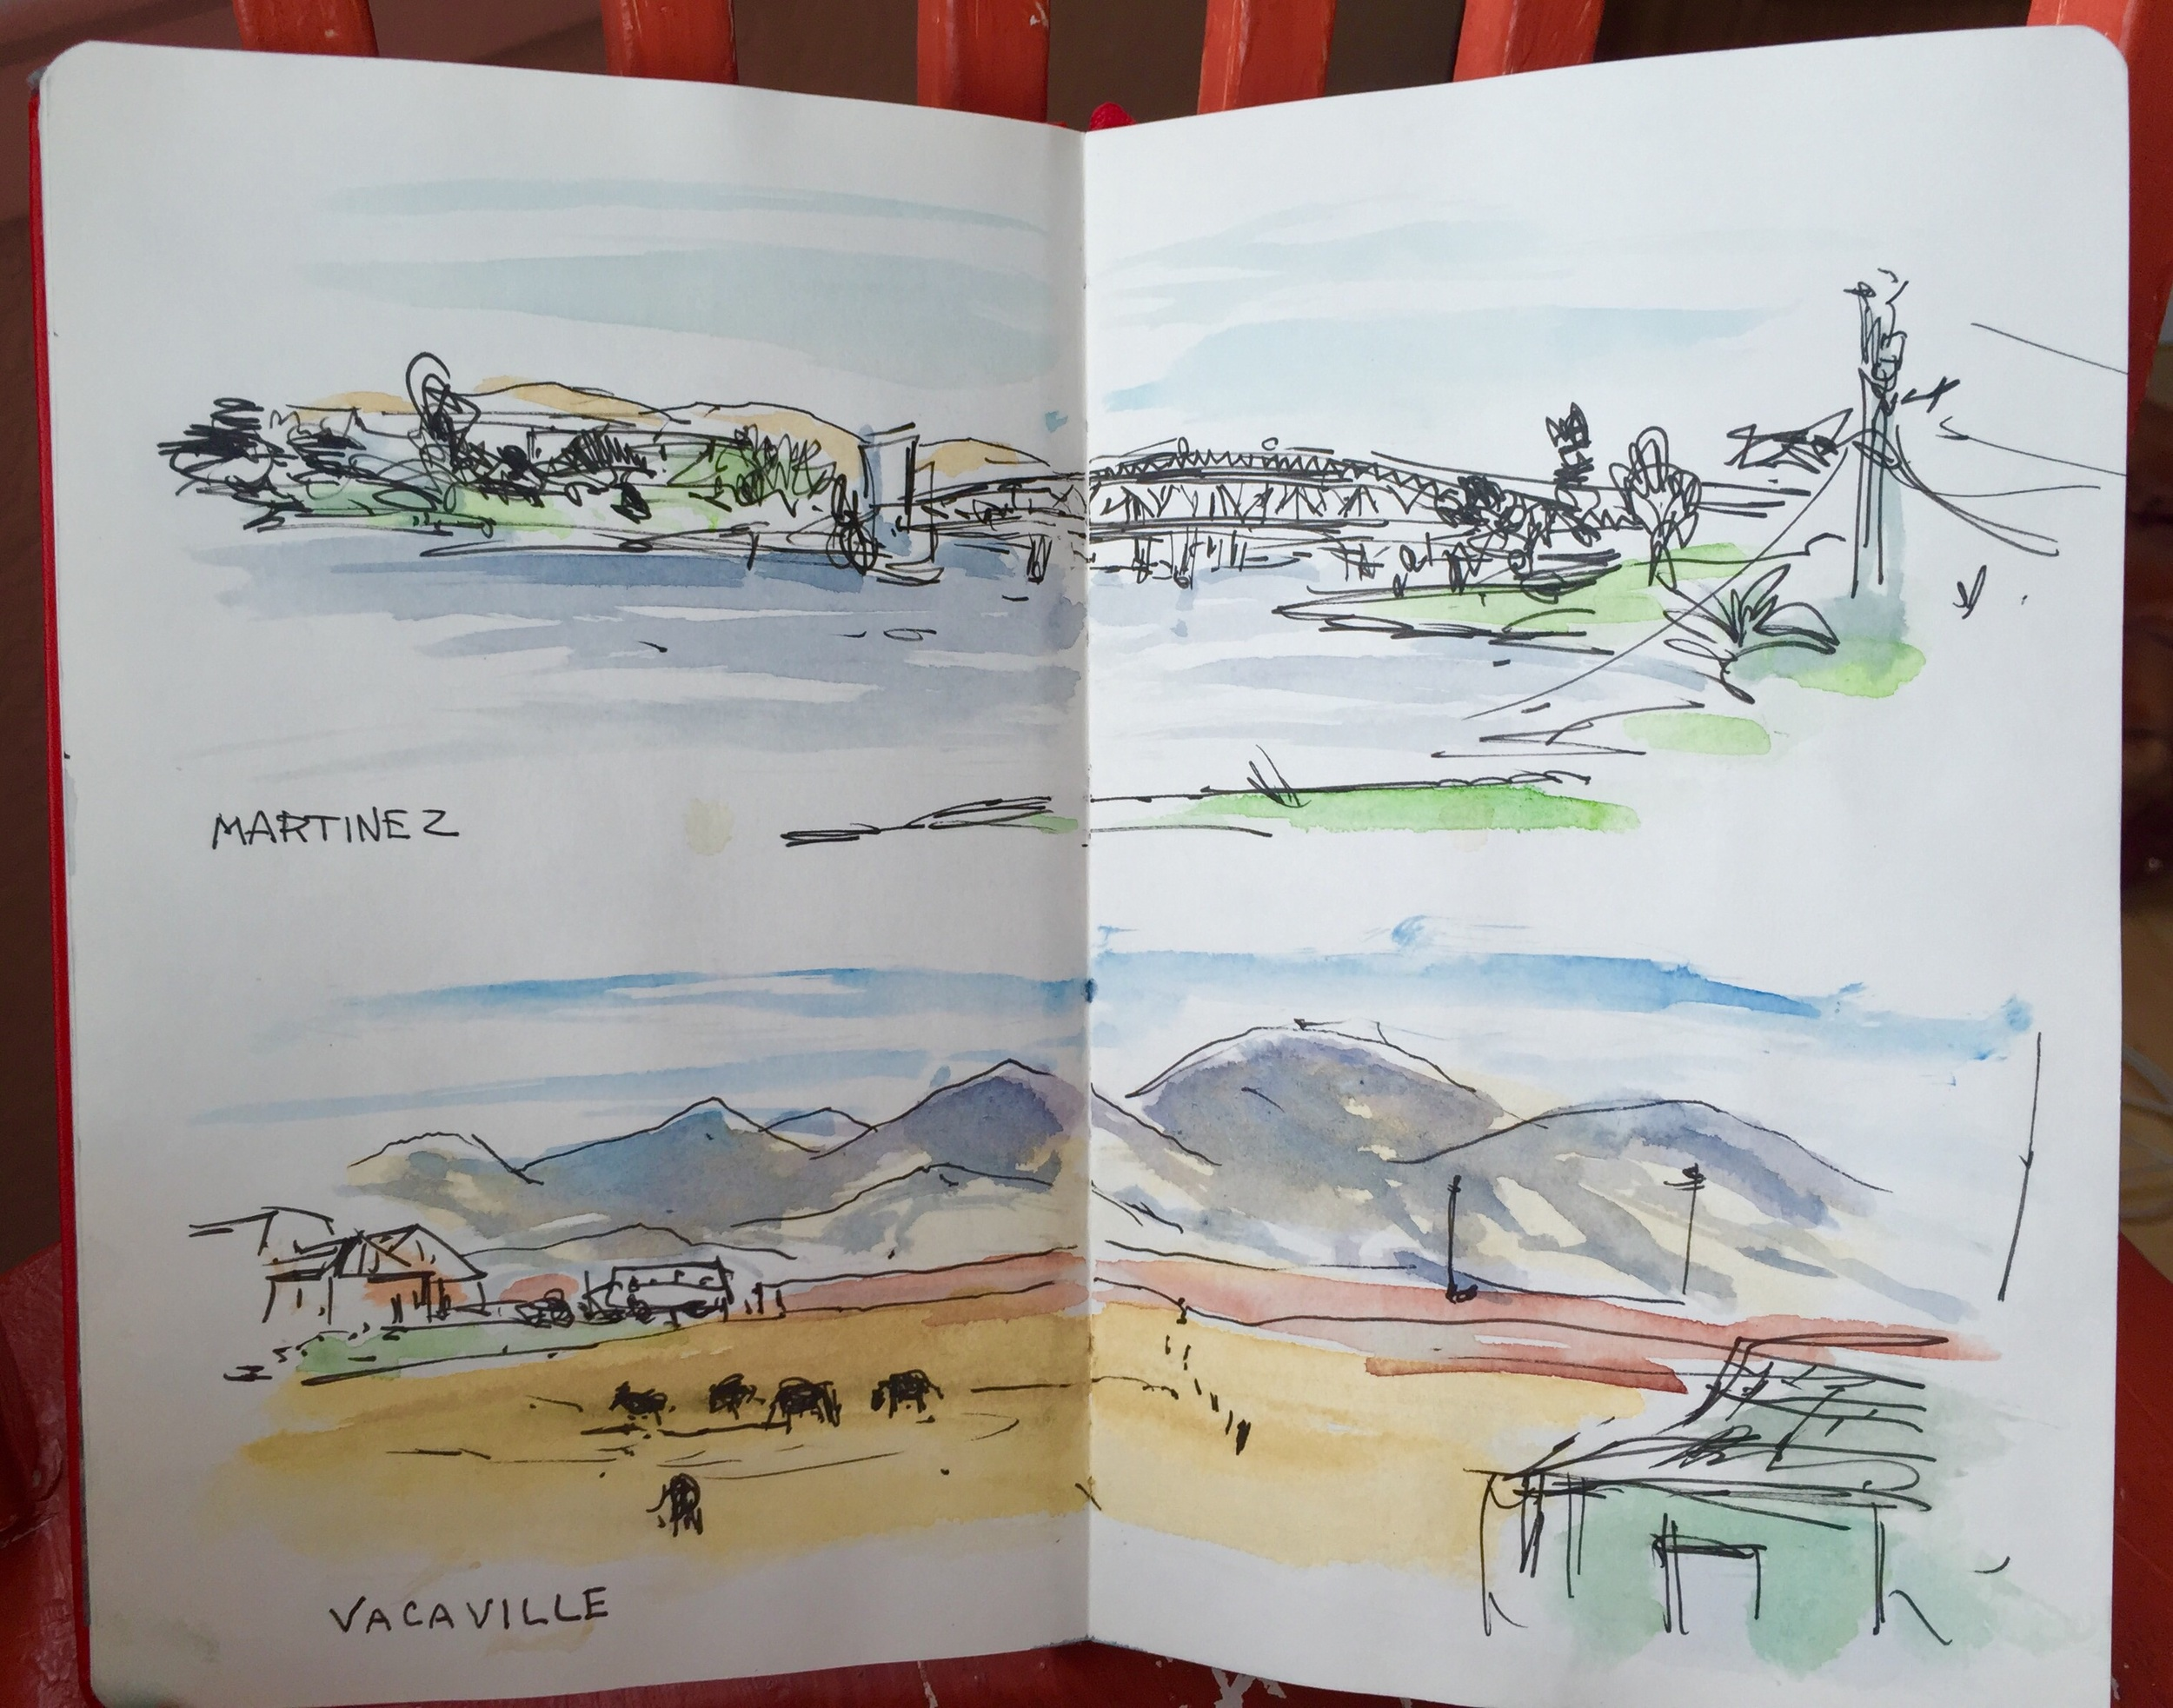 Martinez & Vacaville